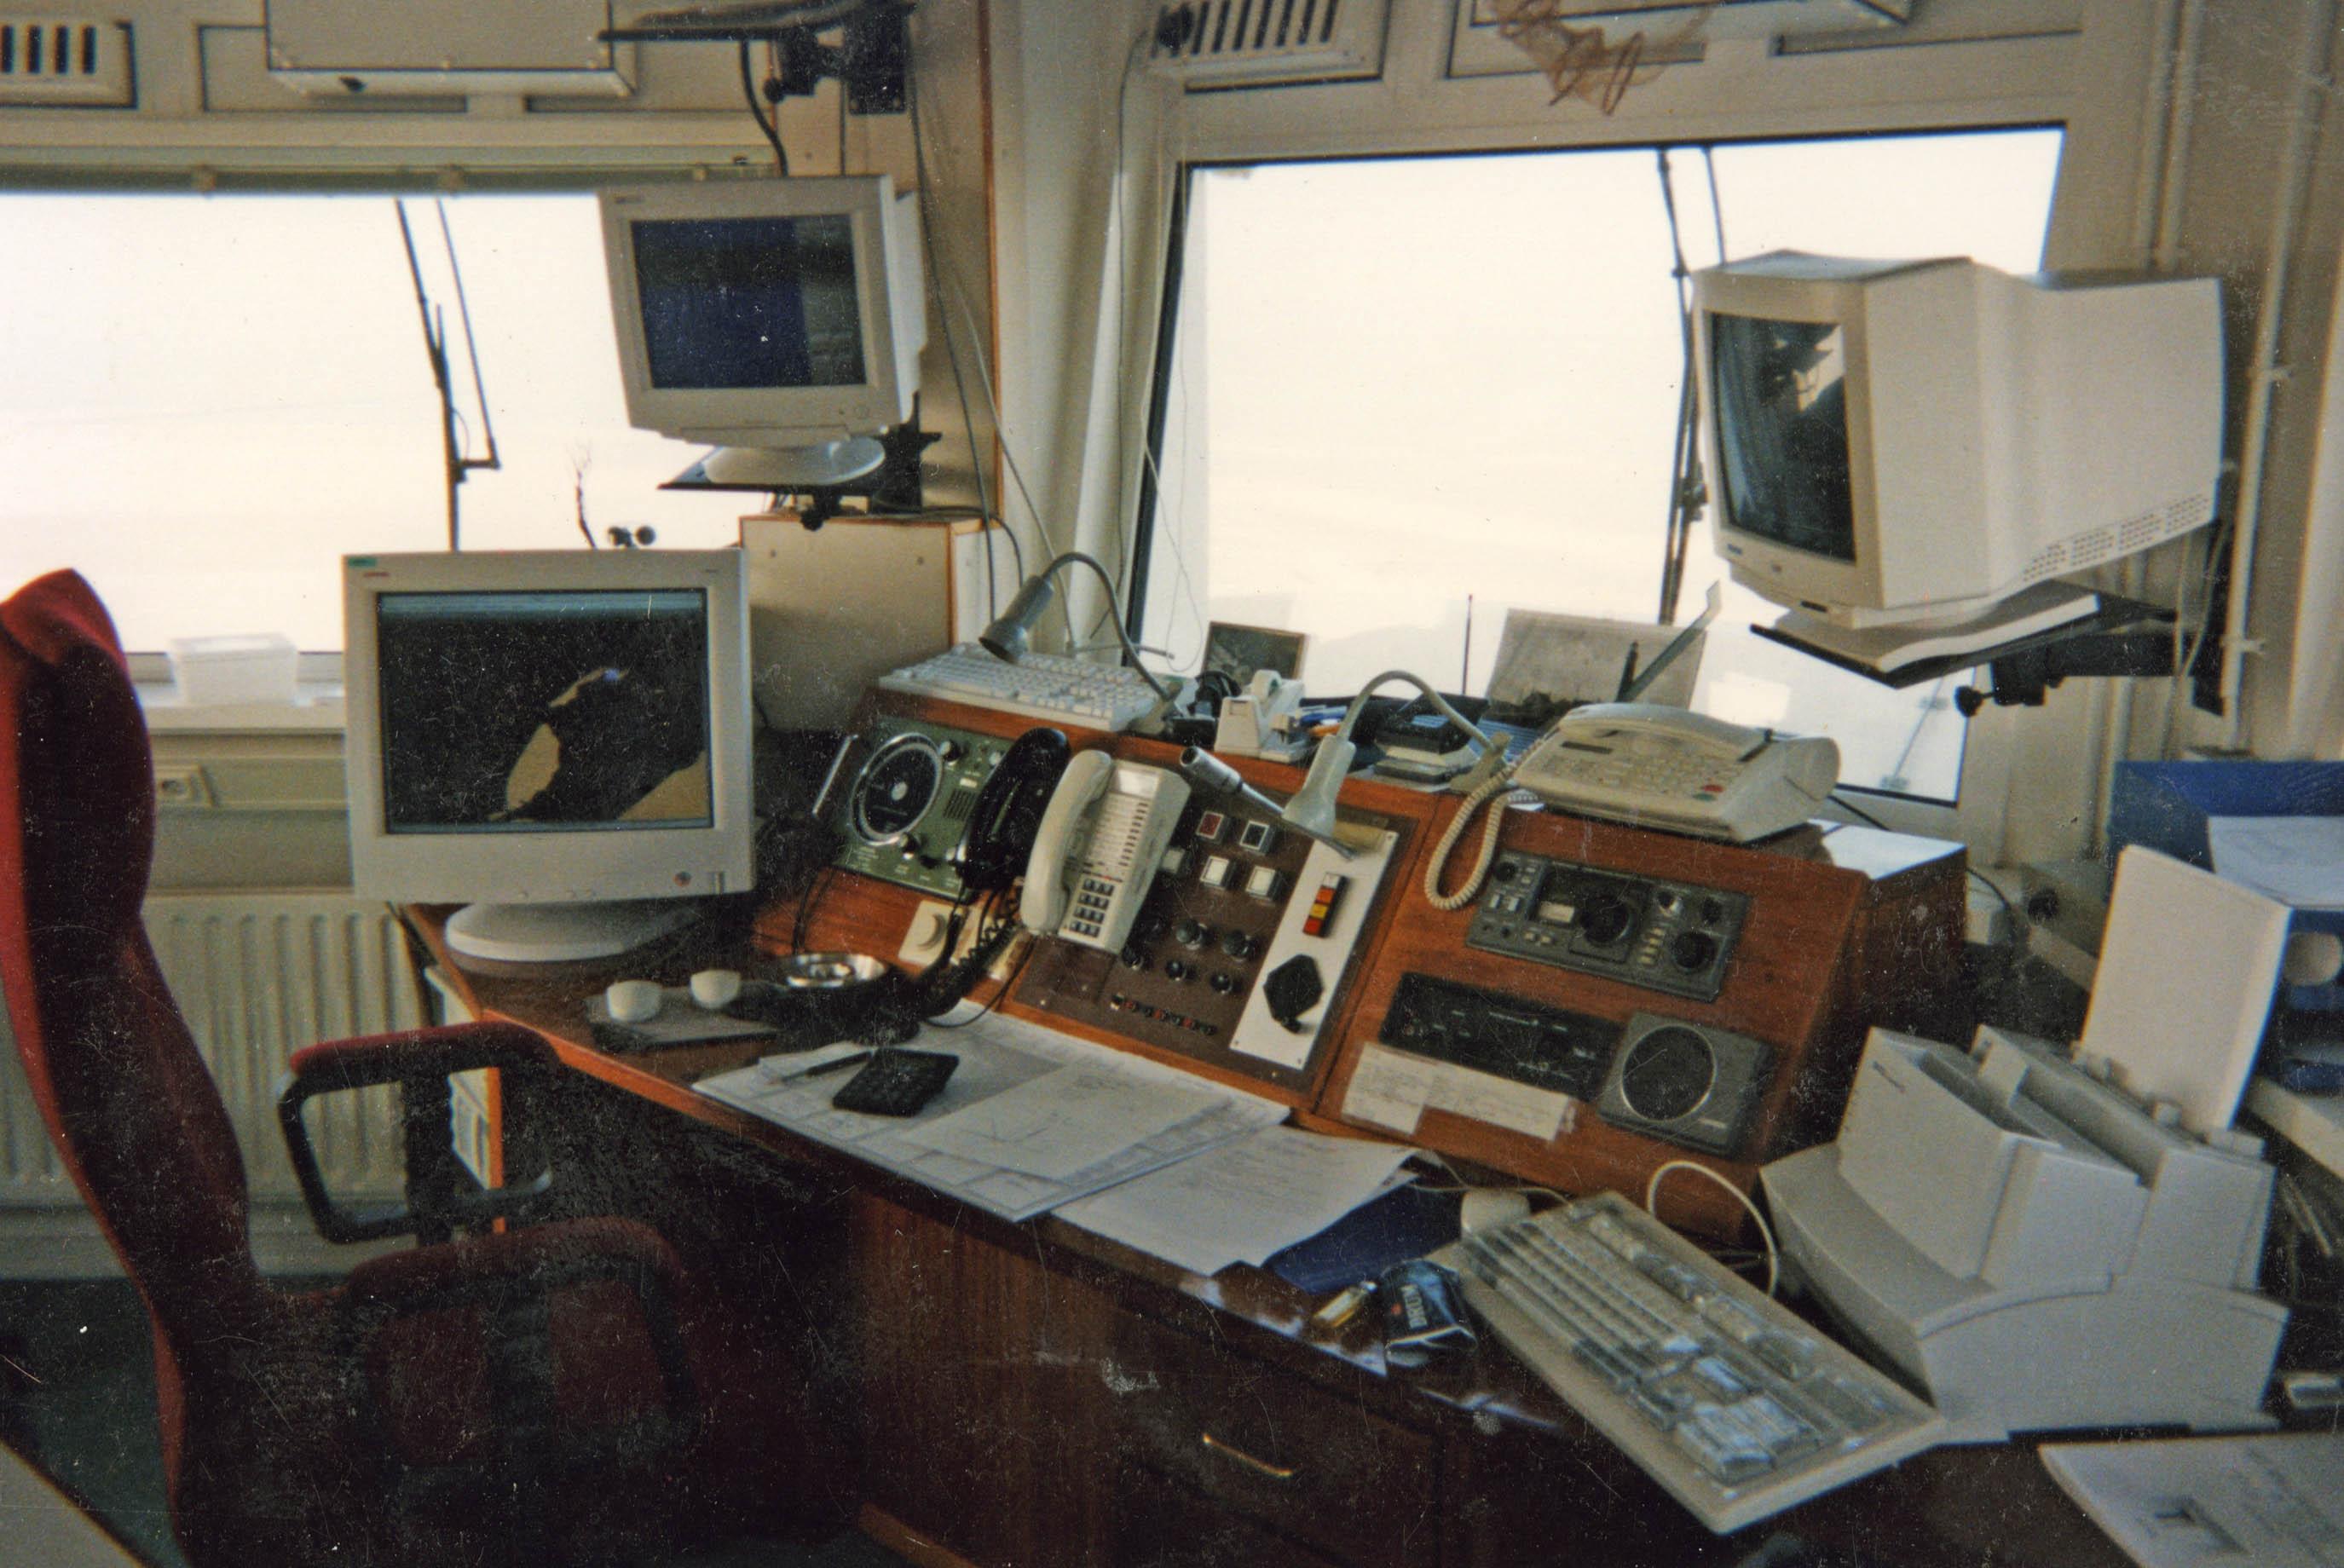 Wachtruimte Vuurtoren Texel, jaren \'90 - Vuurtoren Texel